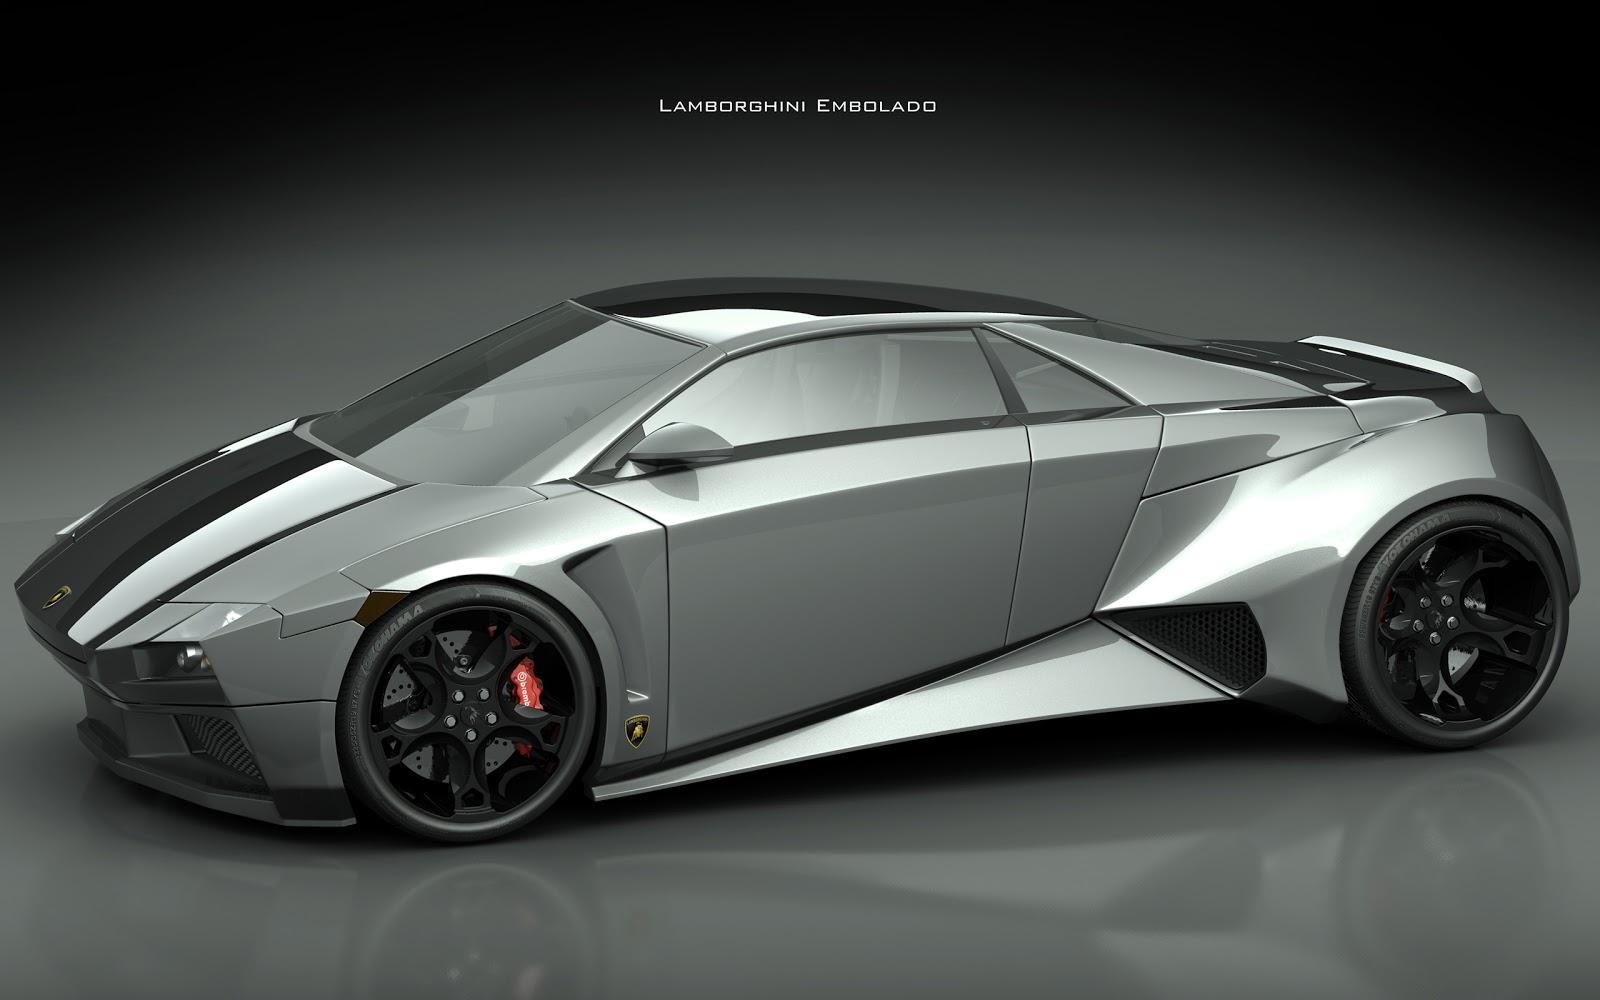 World Of Cars Lamborghini Embolado Wallpaper